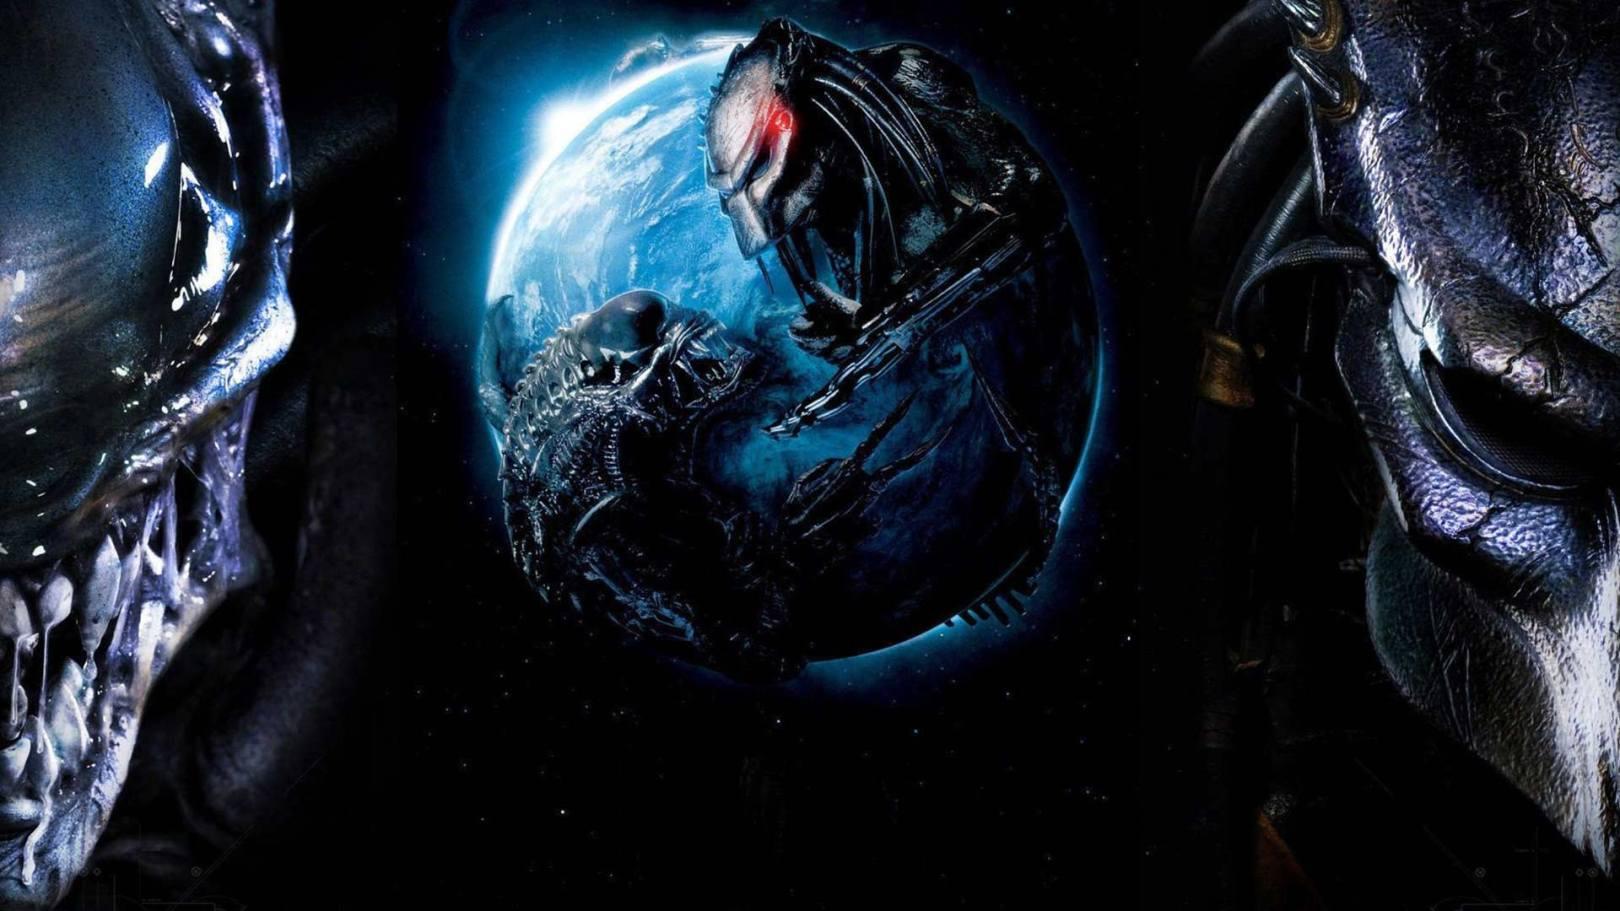 FOTF Face-Off | Alien vs. Predator: Which Movie Is Better?